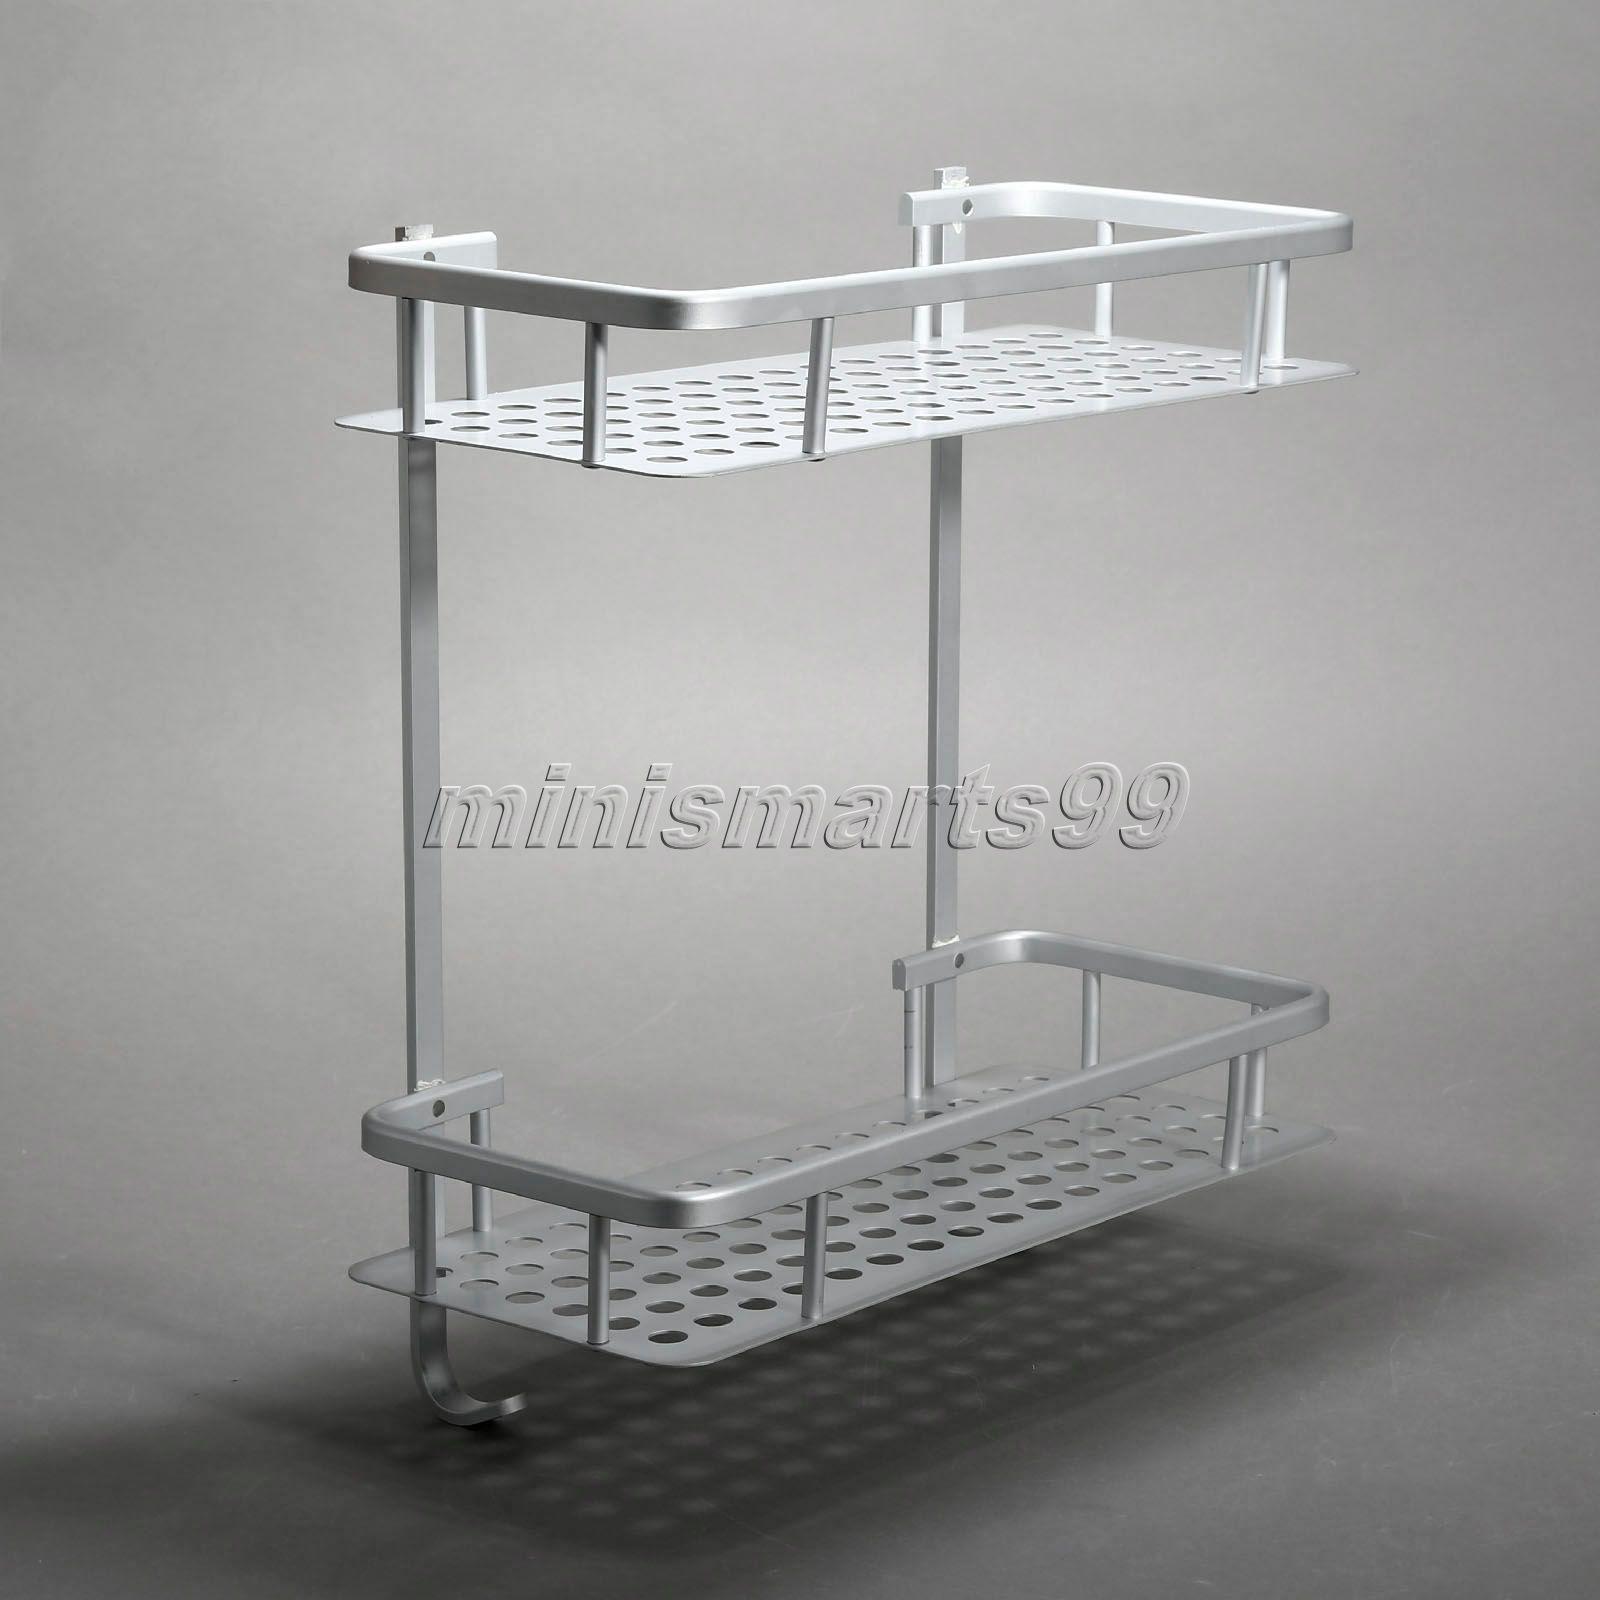 basket item aluminum bathroom shelf rack holder shampoo washing towel accessories bar in double shelves layers hook shower